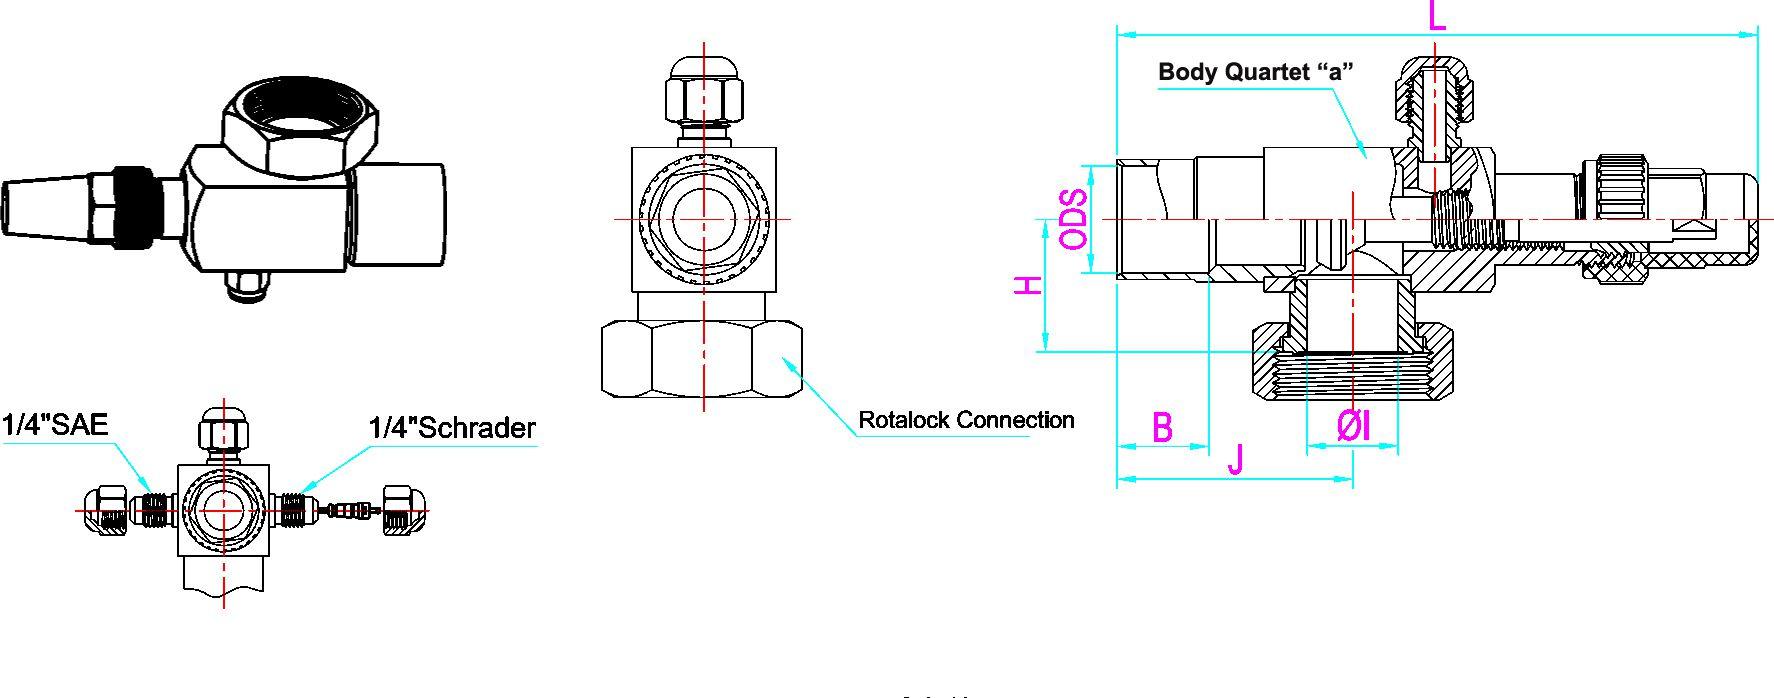 lett rotalock valves drawing